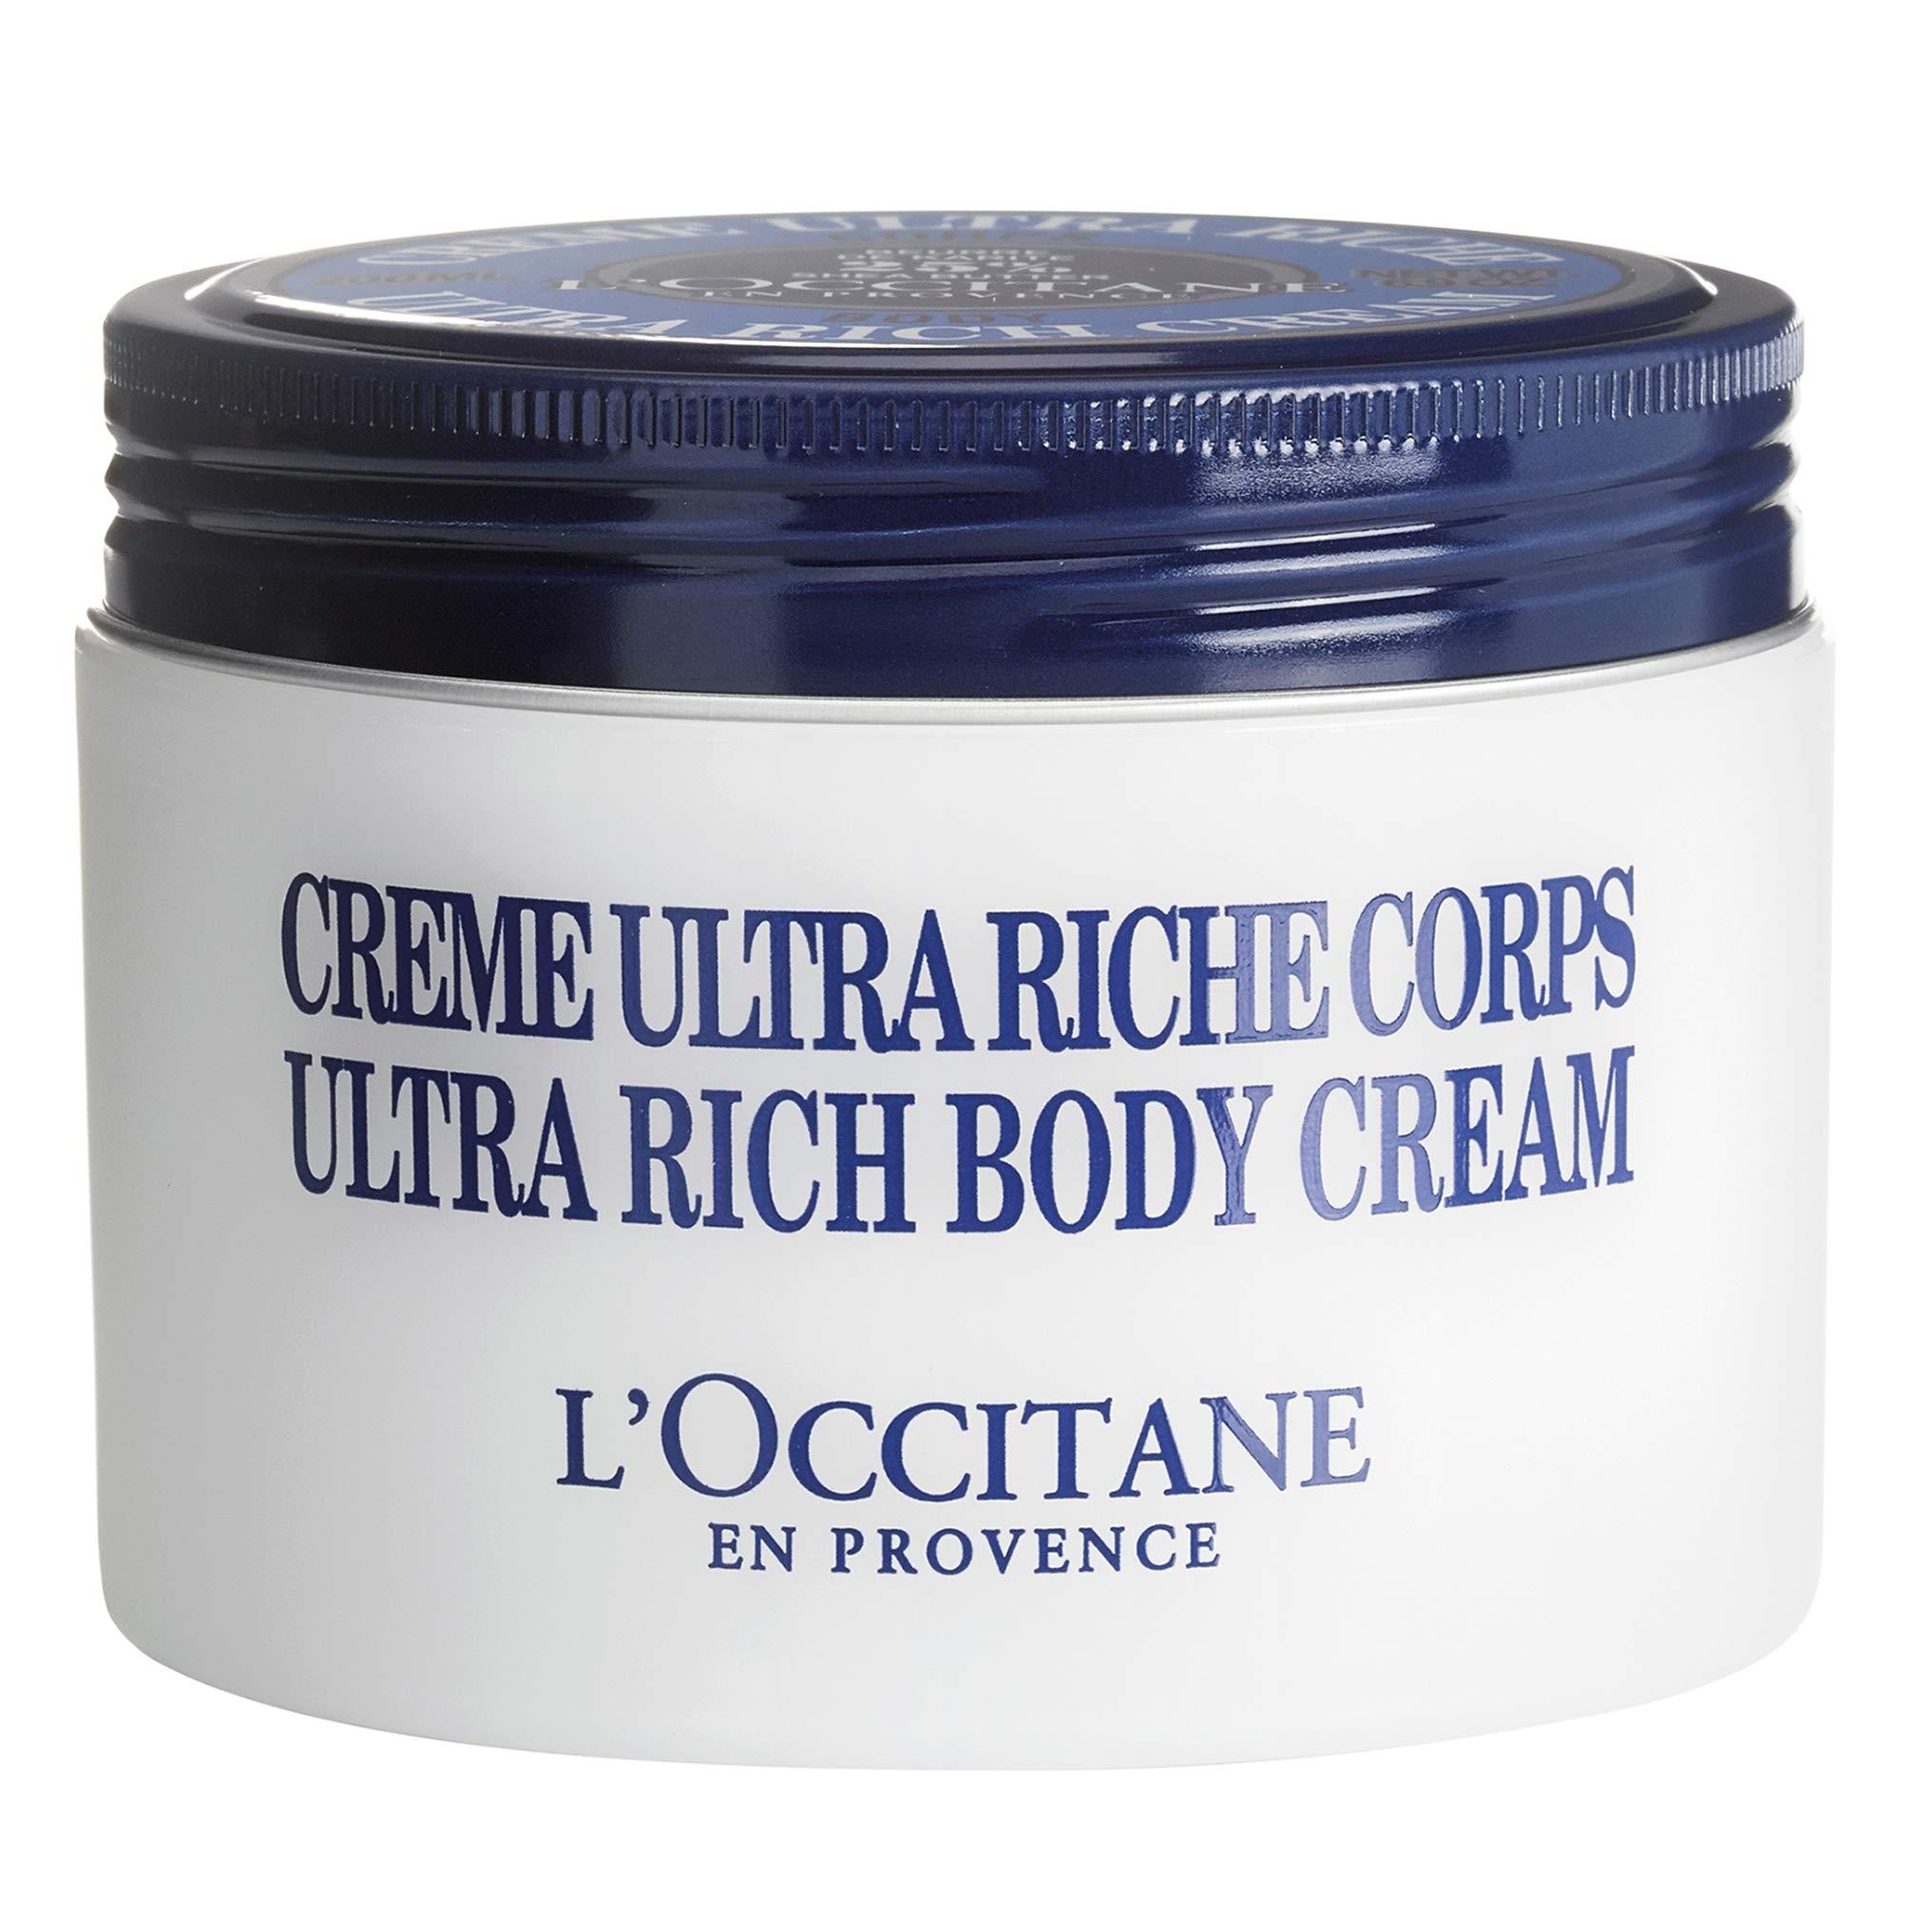 L'Occitane Moisturizing 25% Shea Butter Ultra-Rich Body Cream, Net Wt. 6.9 oz by L'Occitane